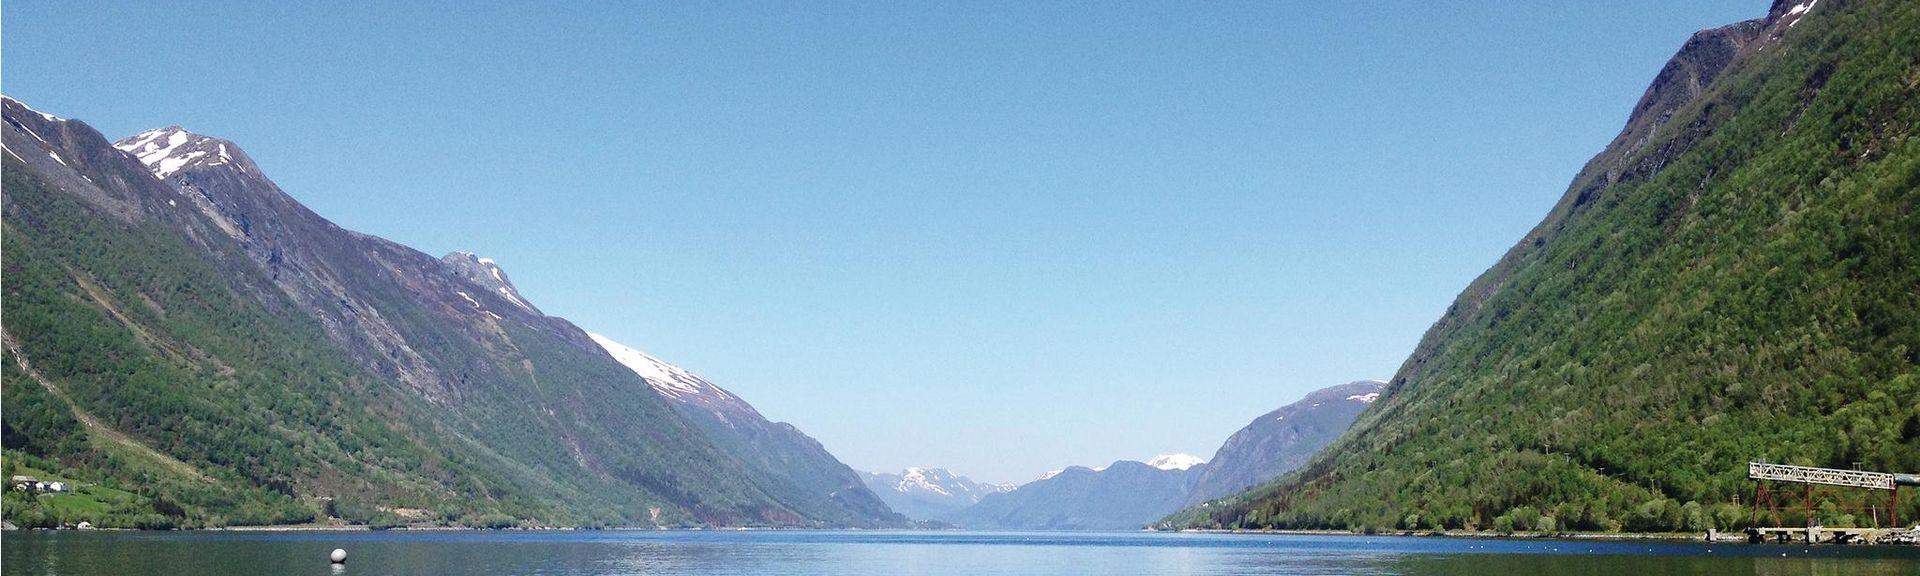 Nordfjord, Bremanger, Vagsoy, Eid, Vestland, Norway